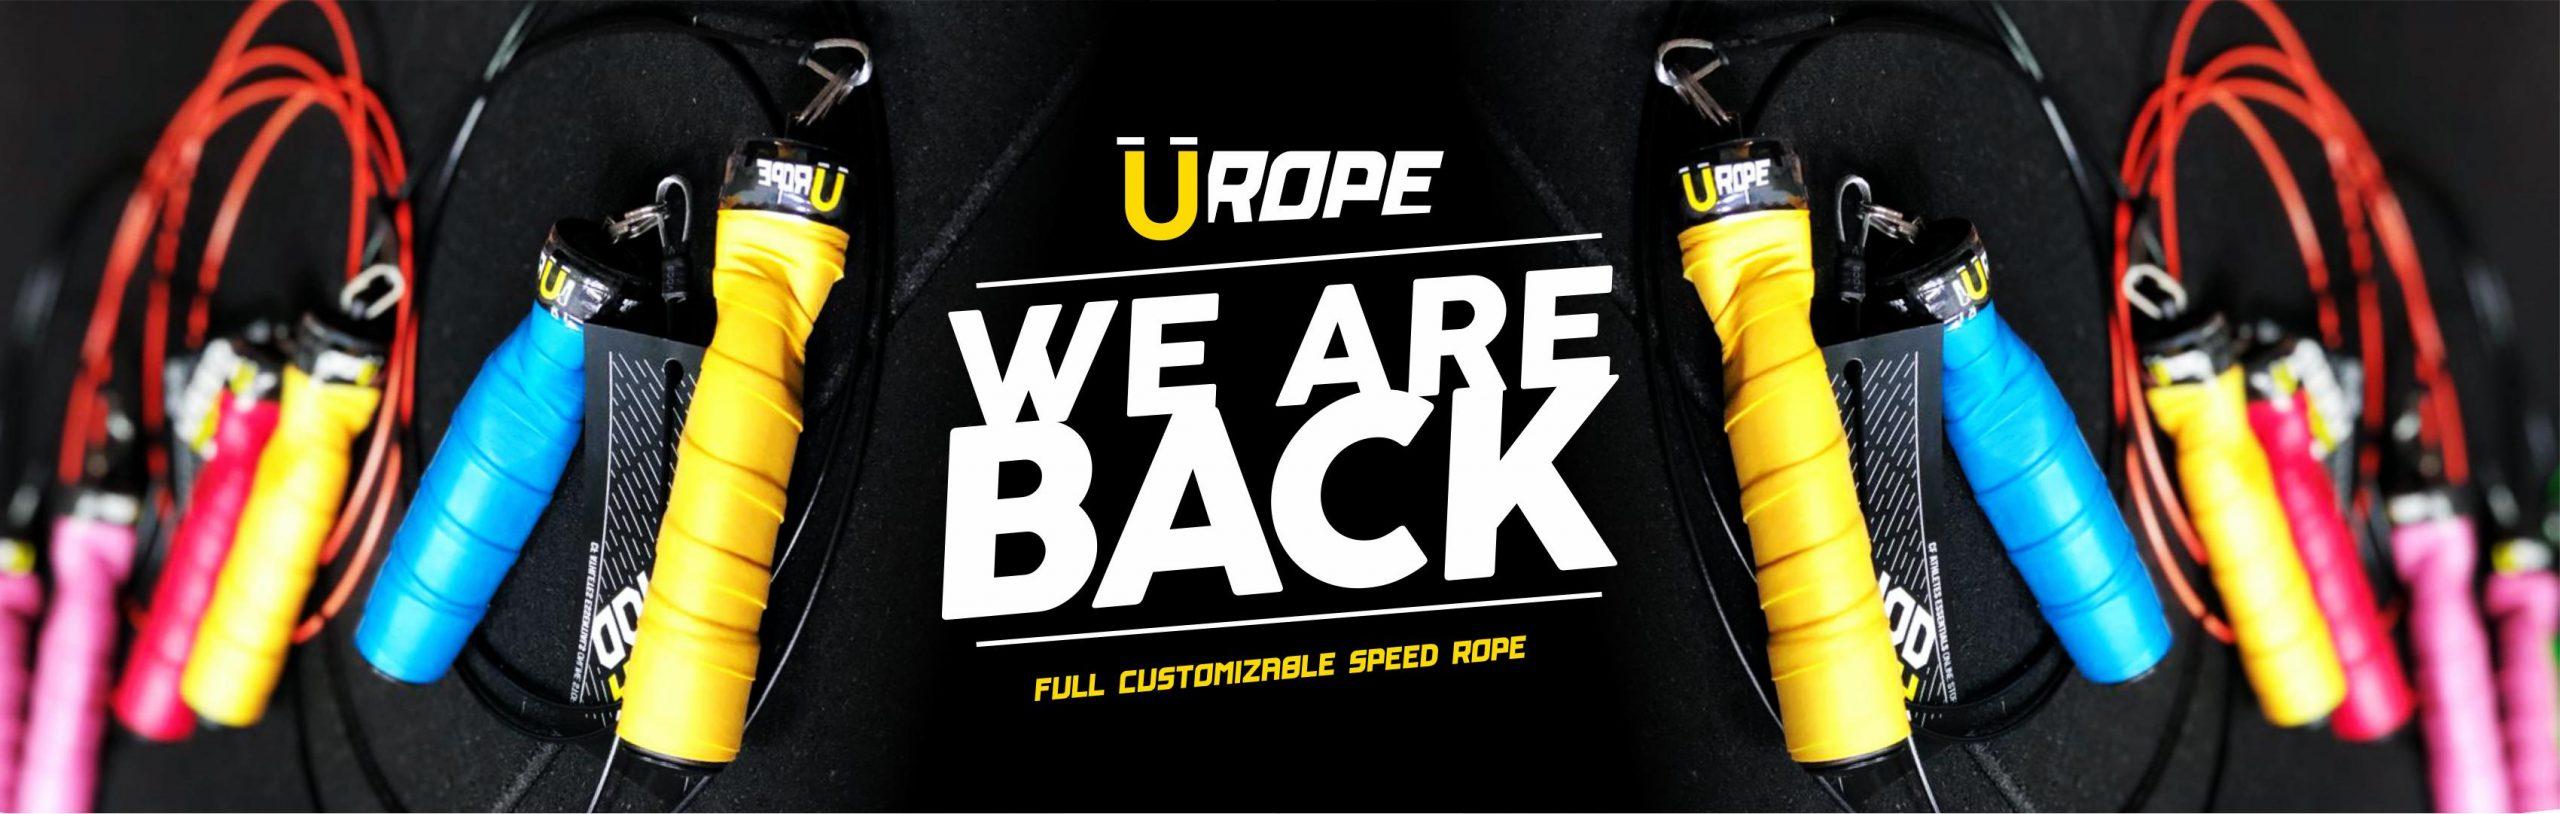 banner-urope-weareback-2